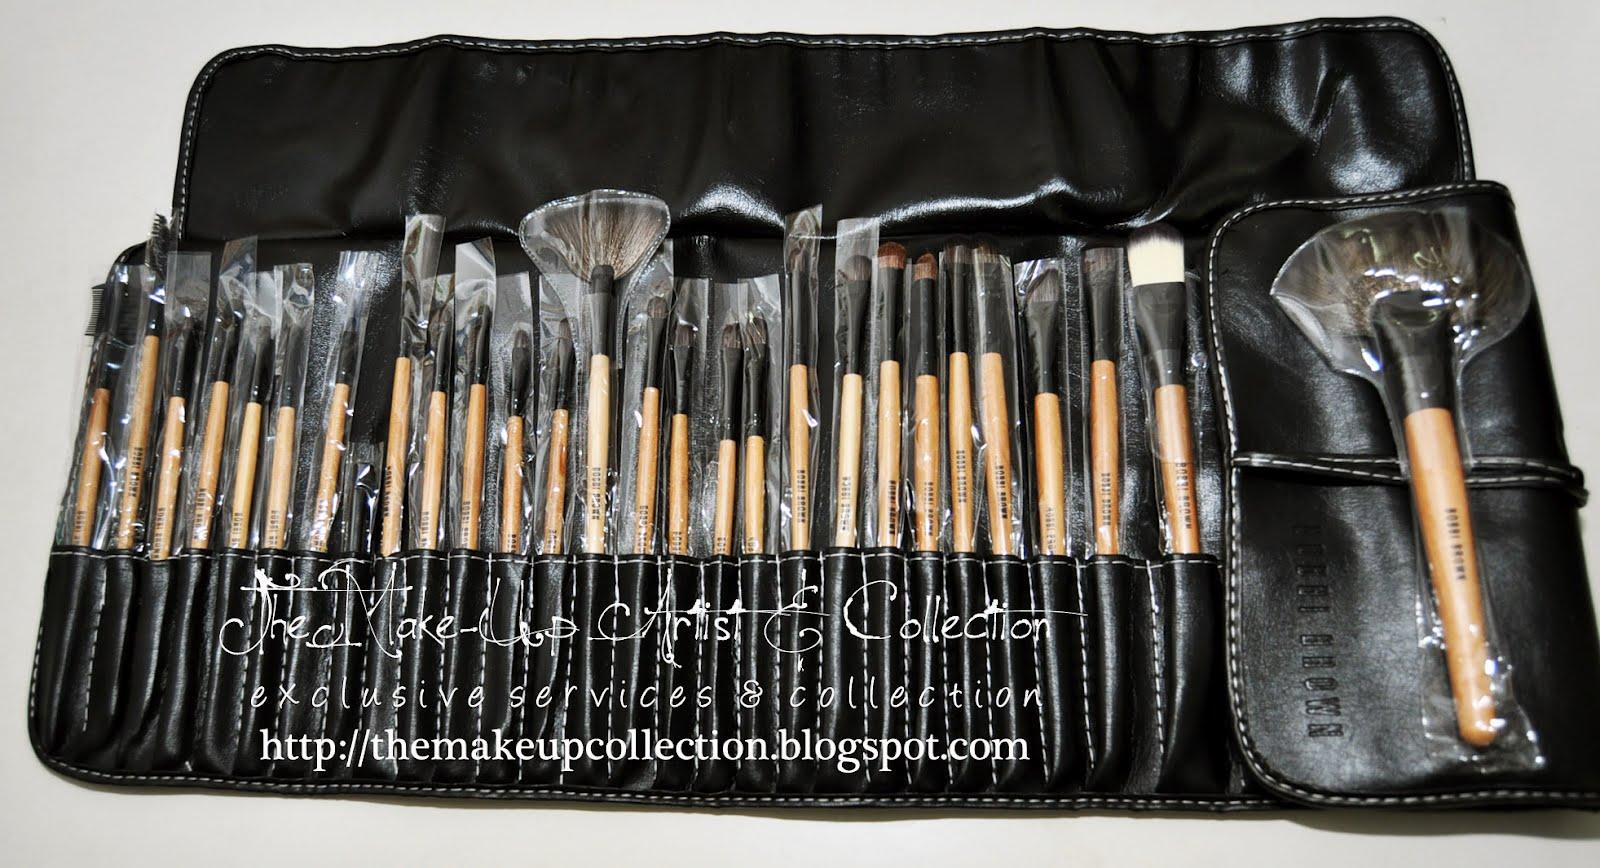 ... Brush Set. Product Code: BBBrush-32. Brand: Bobbi Brown